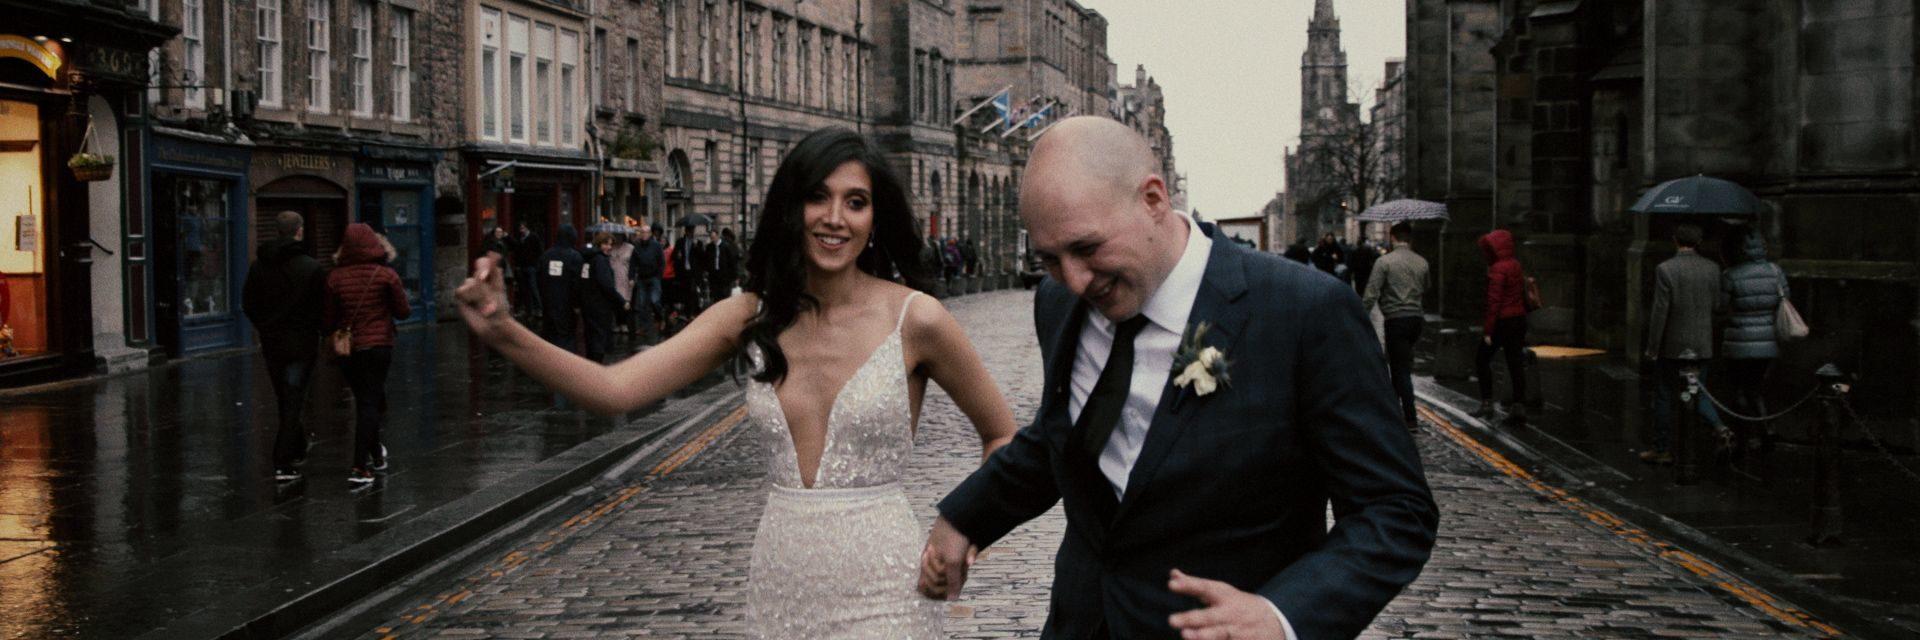 porto-wedding-videographer-cinemate-films-04